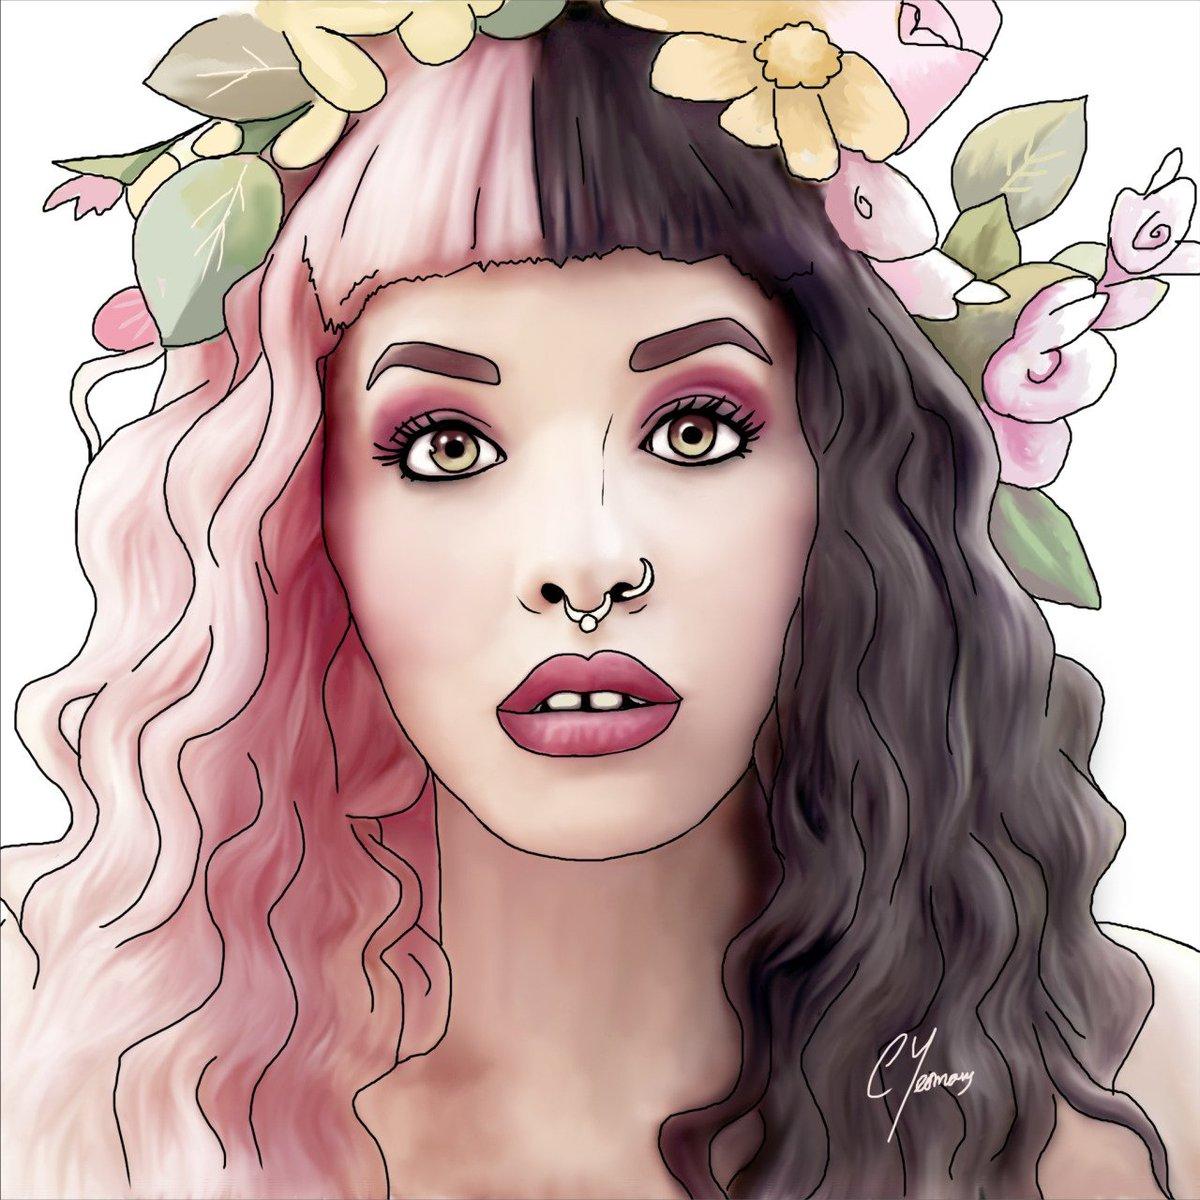 Melanie Martinez On Twitter Desenhos Em Homenagem A Melanie